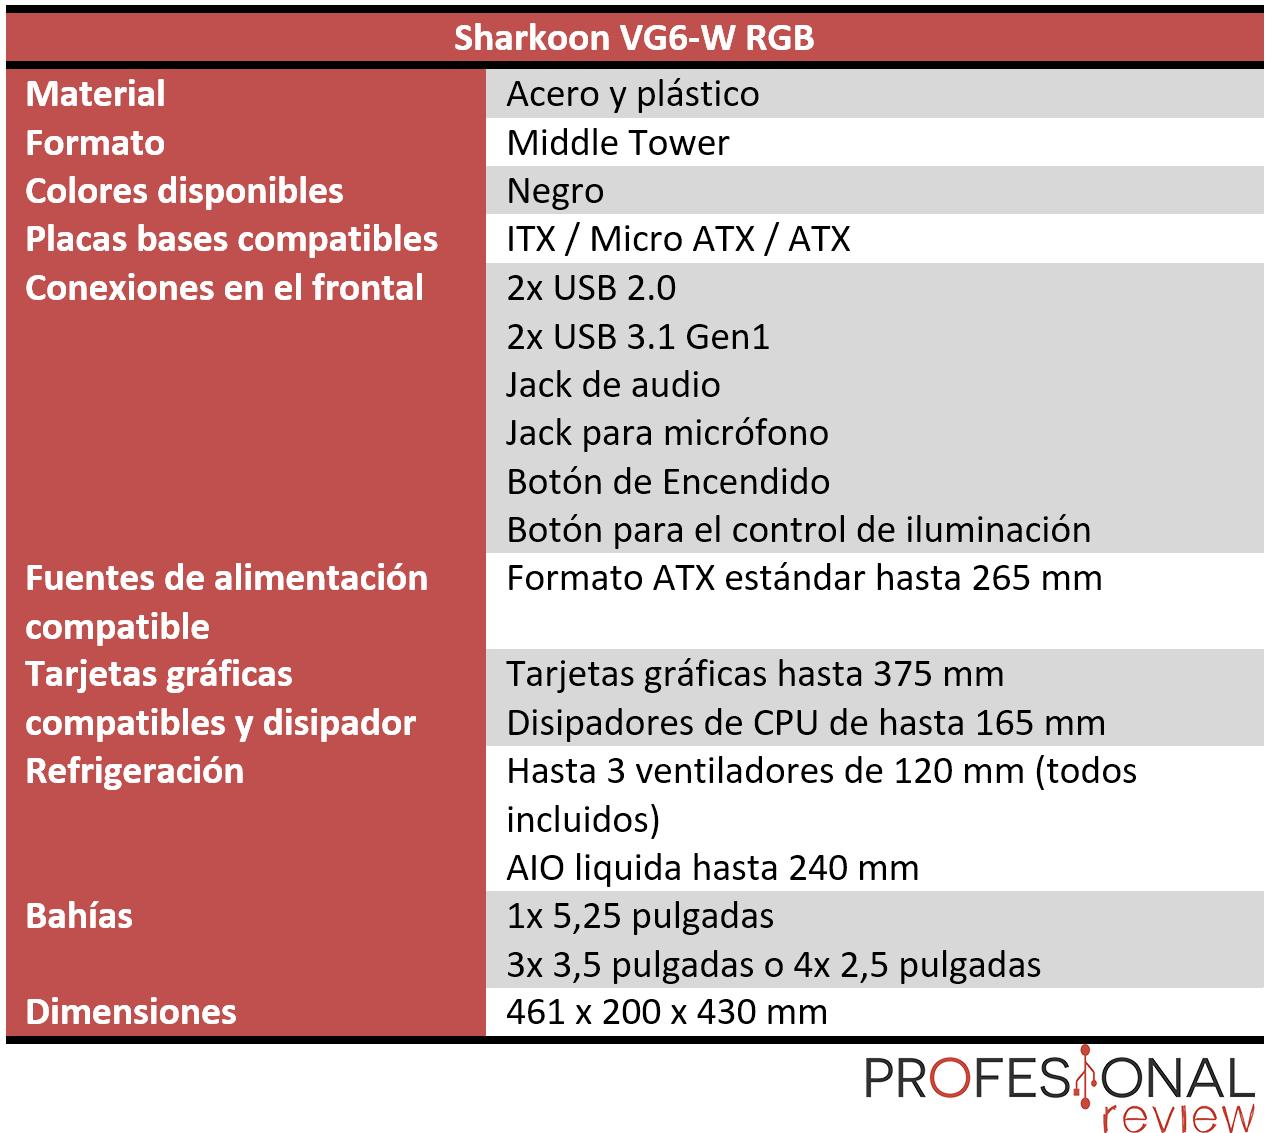 Sharkoon VG6-W RGB Características